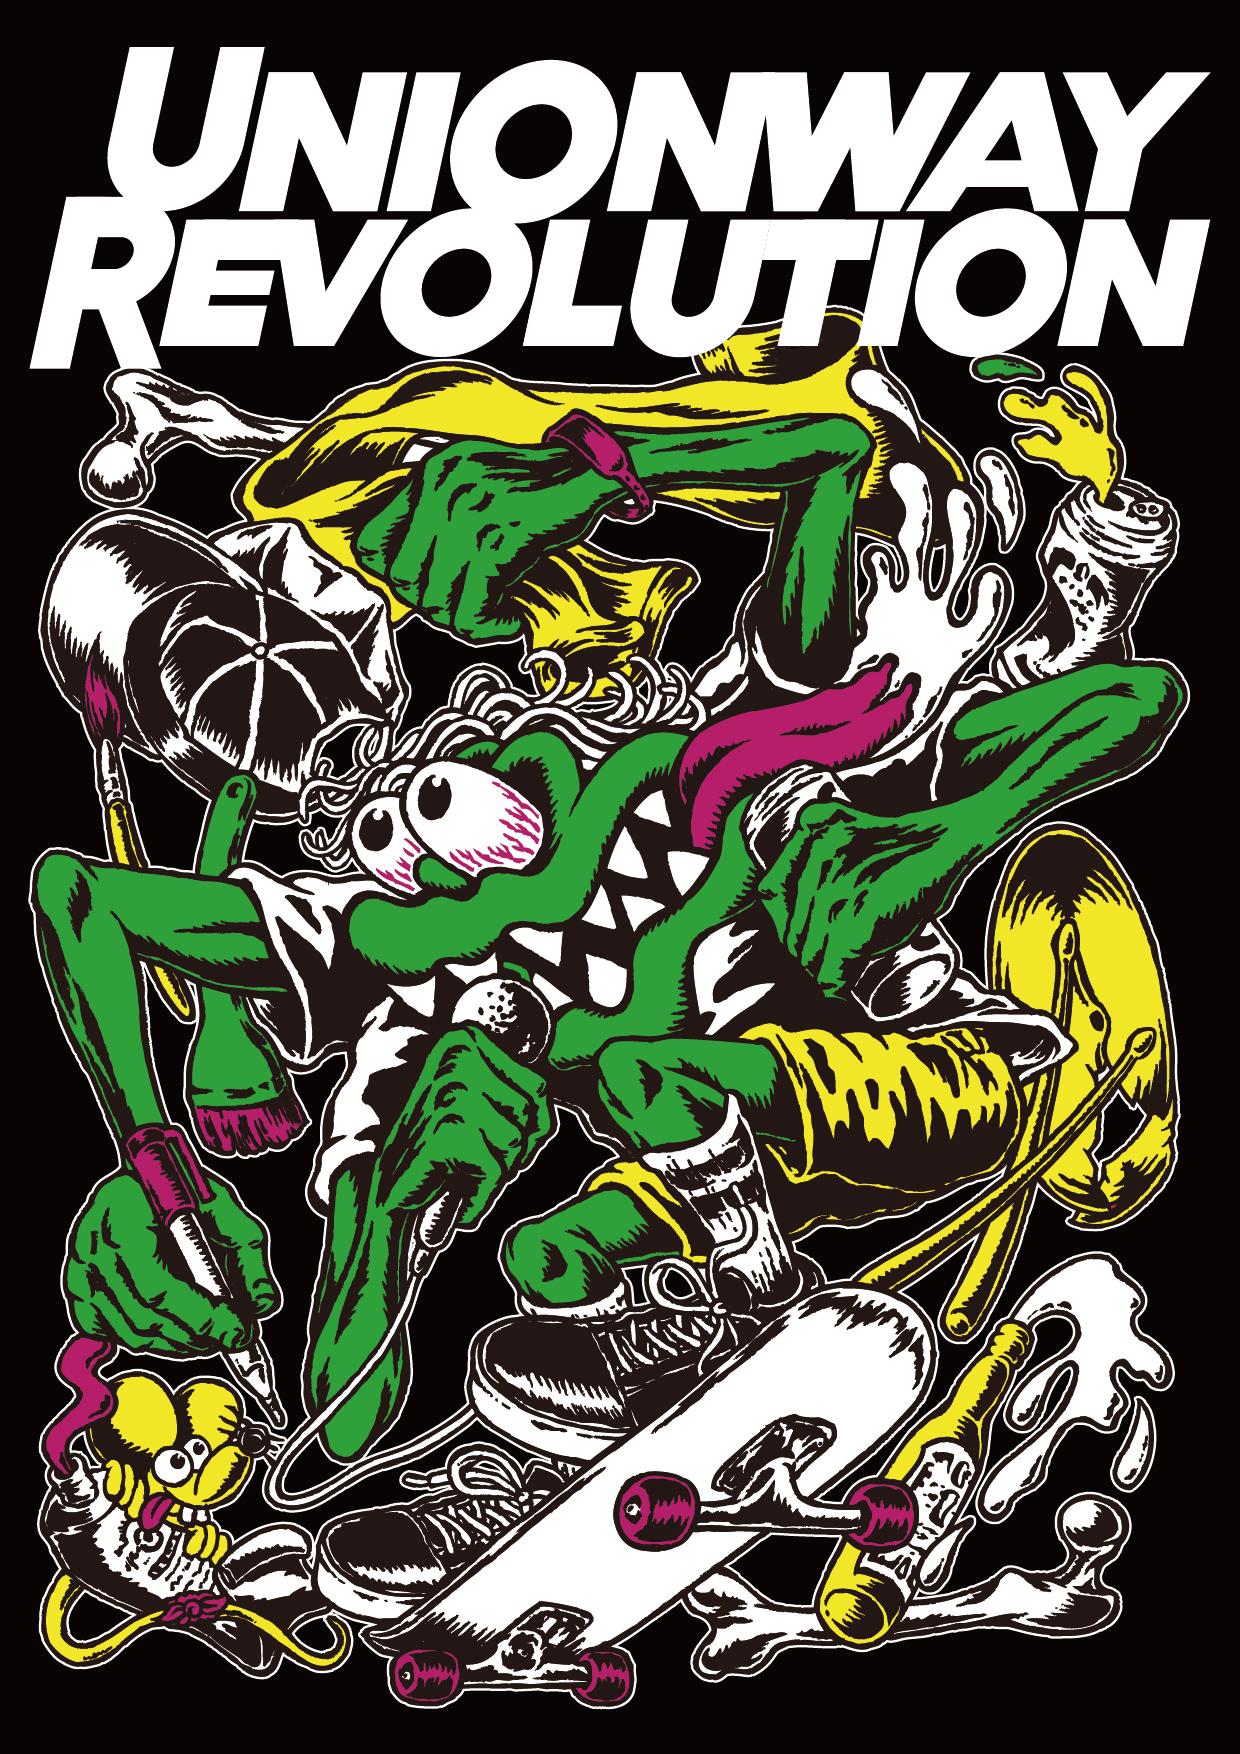 unionwayrevolution_main-01